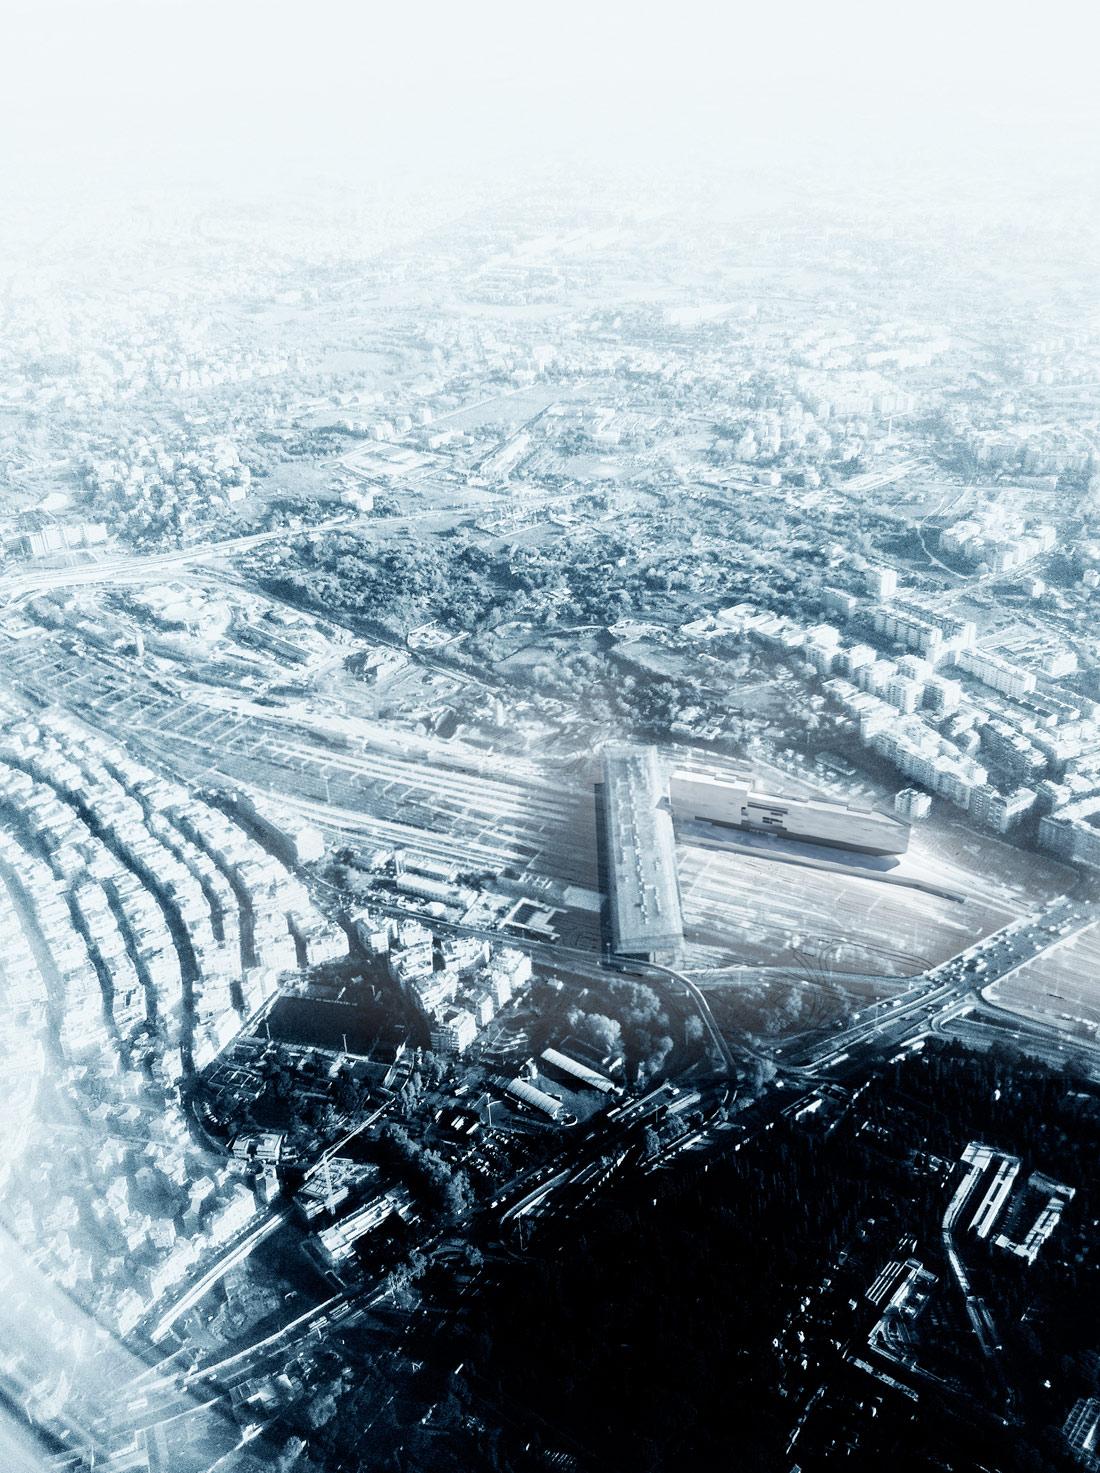 The project and the Tiburtina railway station }